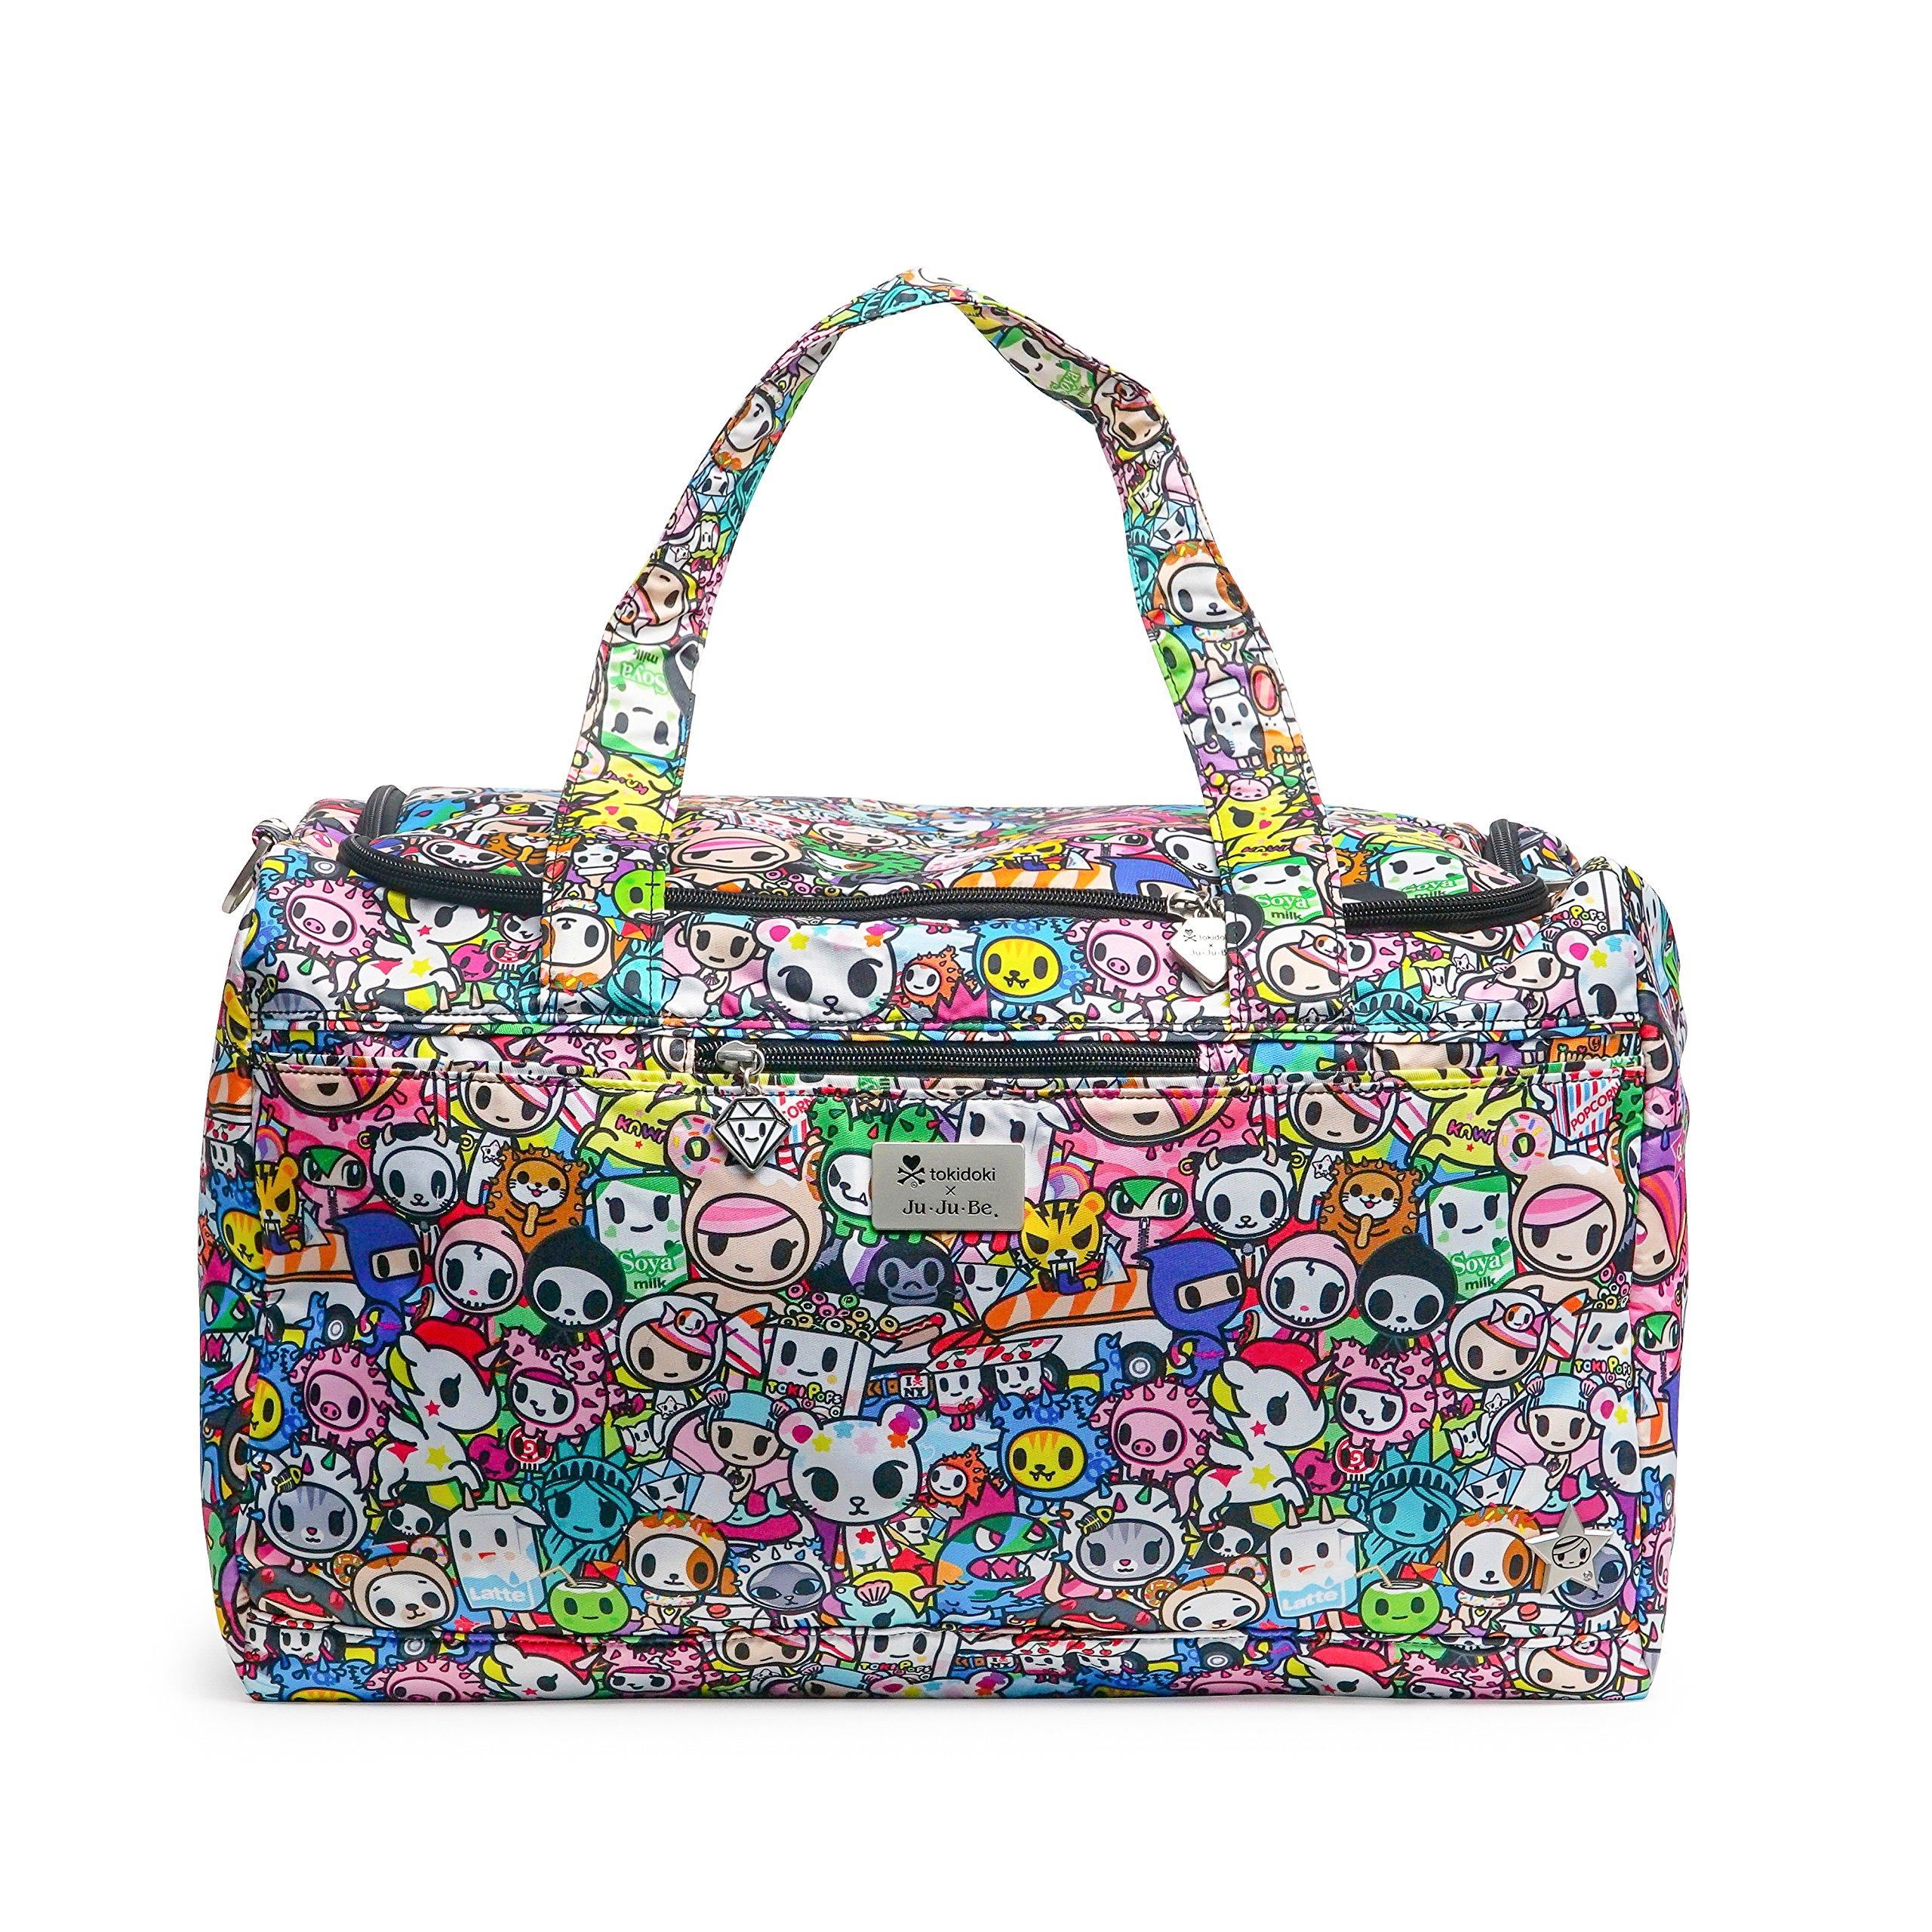 Ju-Ju-Be Starlet Travel Duffel Bag, Iconic 2.0